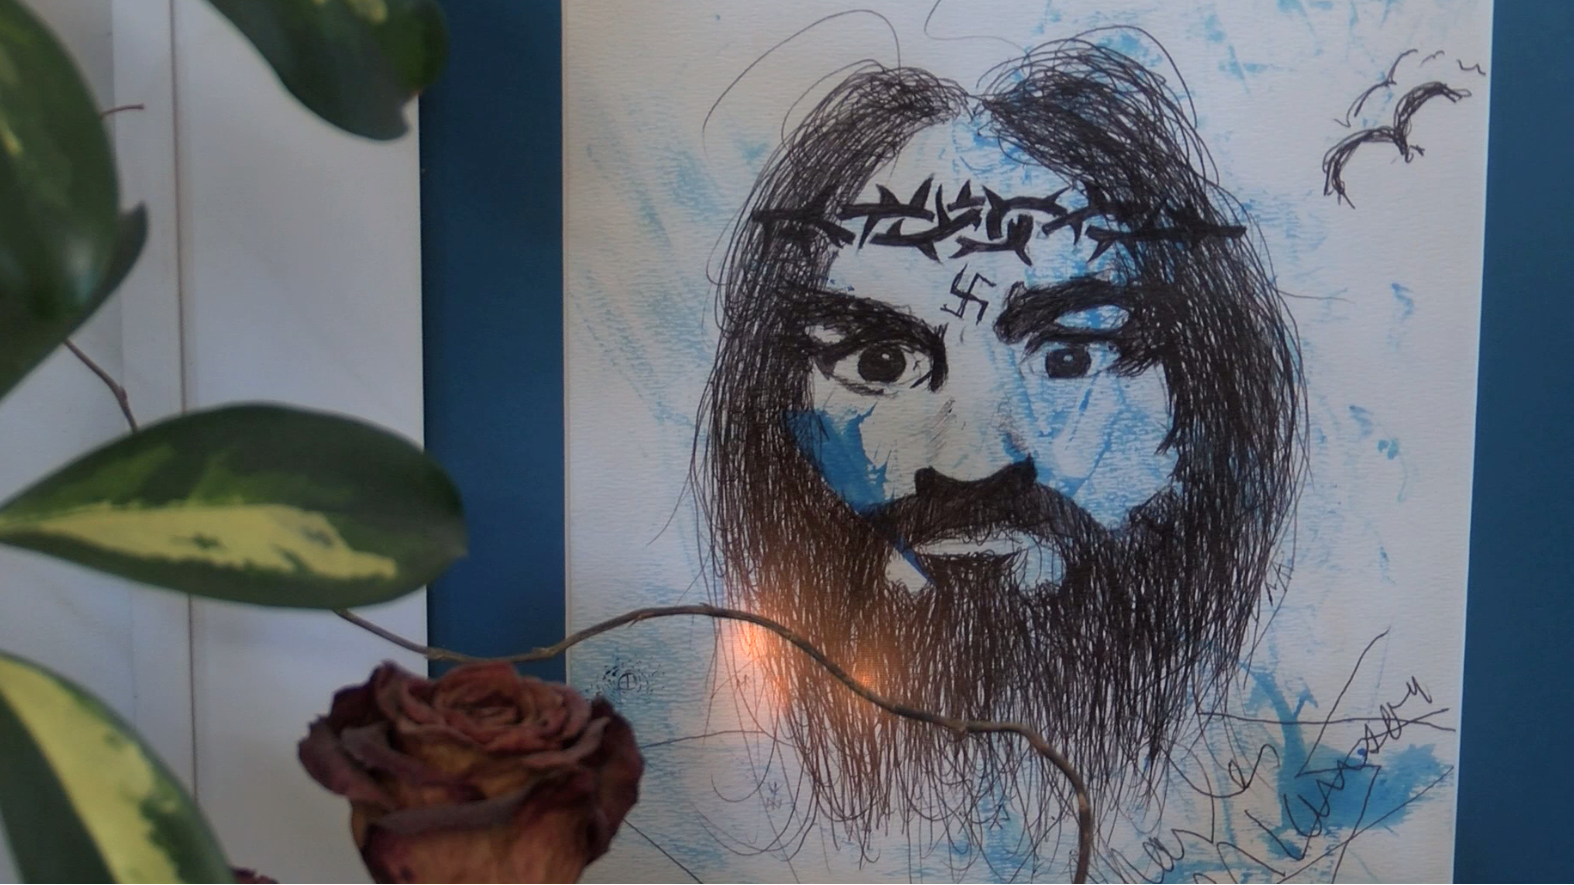 Valley man shares his killer art